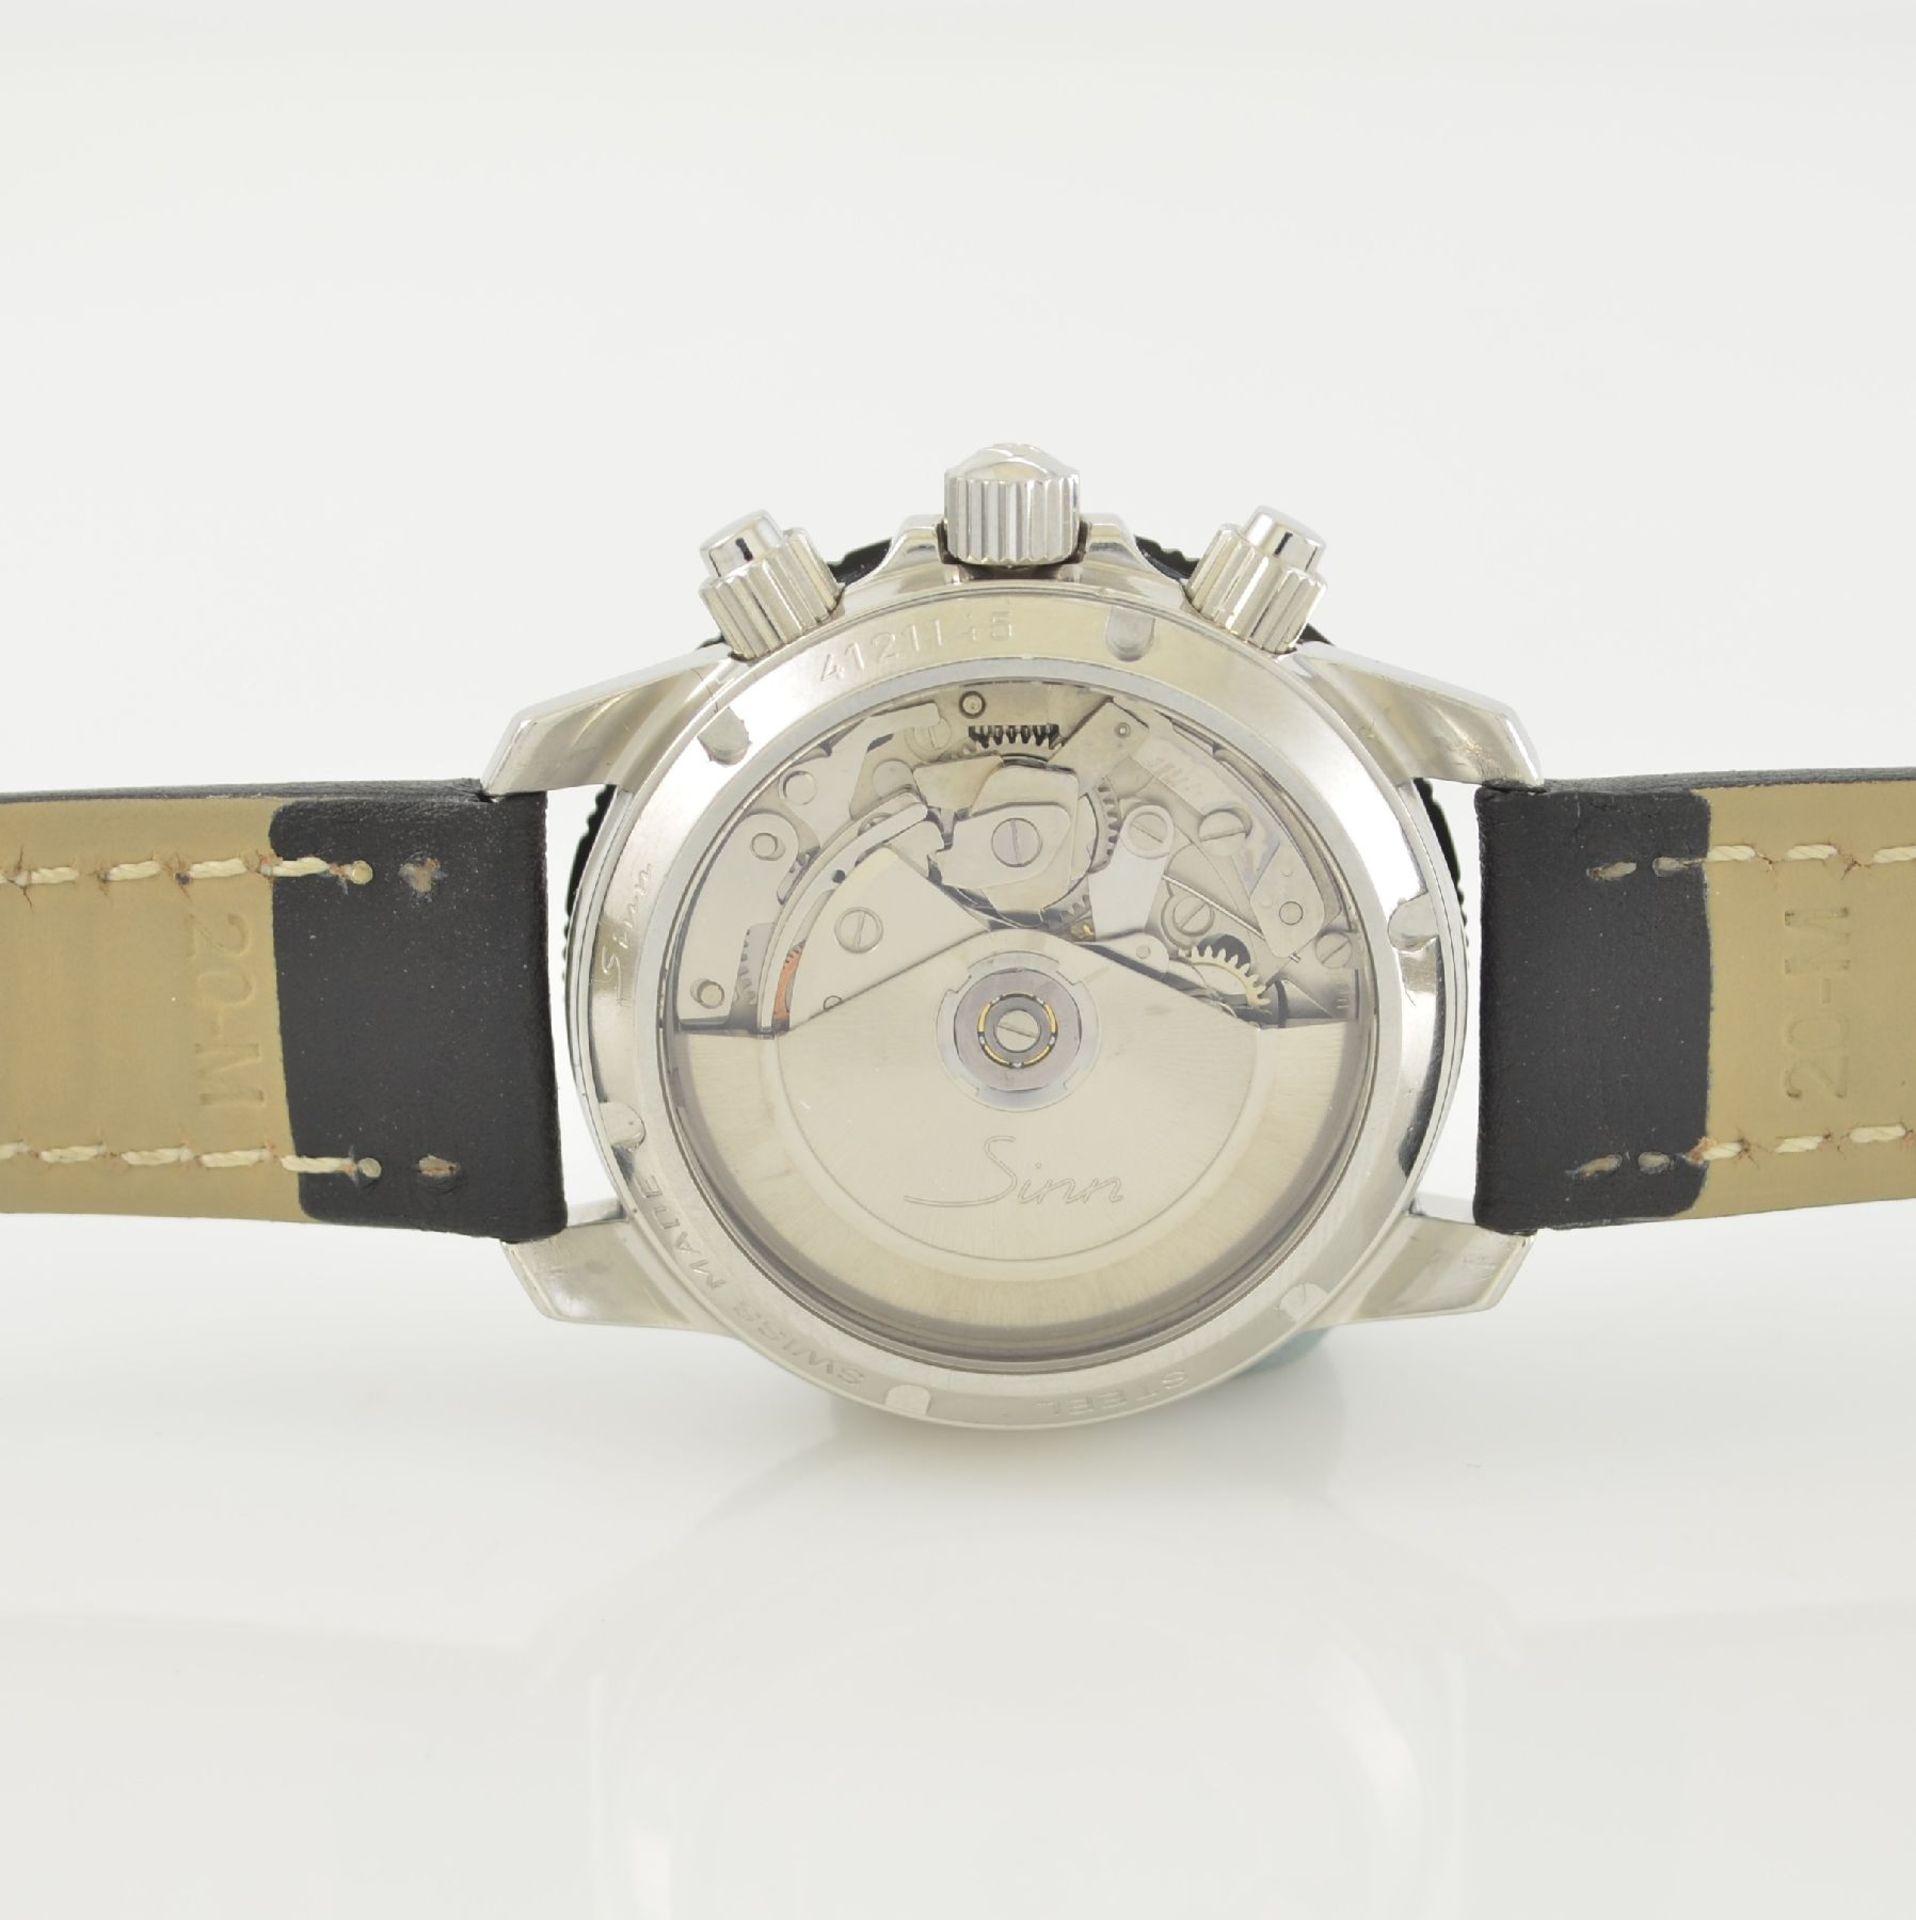 SINN Armbandchronograph, Automatik, Schweiz um 2010, pol. Edelstahlgeh. inkl. orig. Lederband m. - Bild 6 aus 6